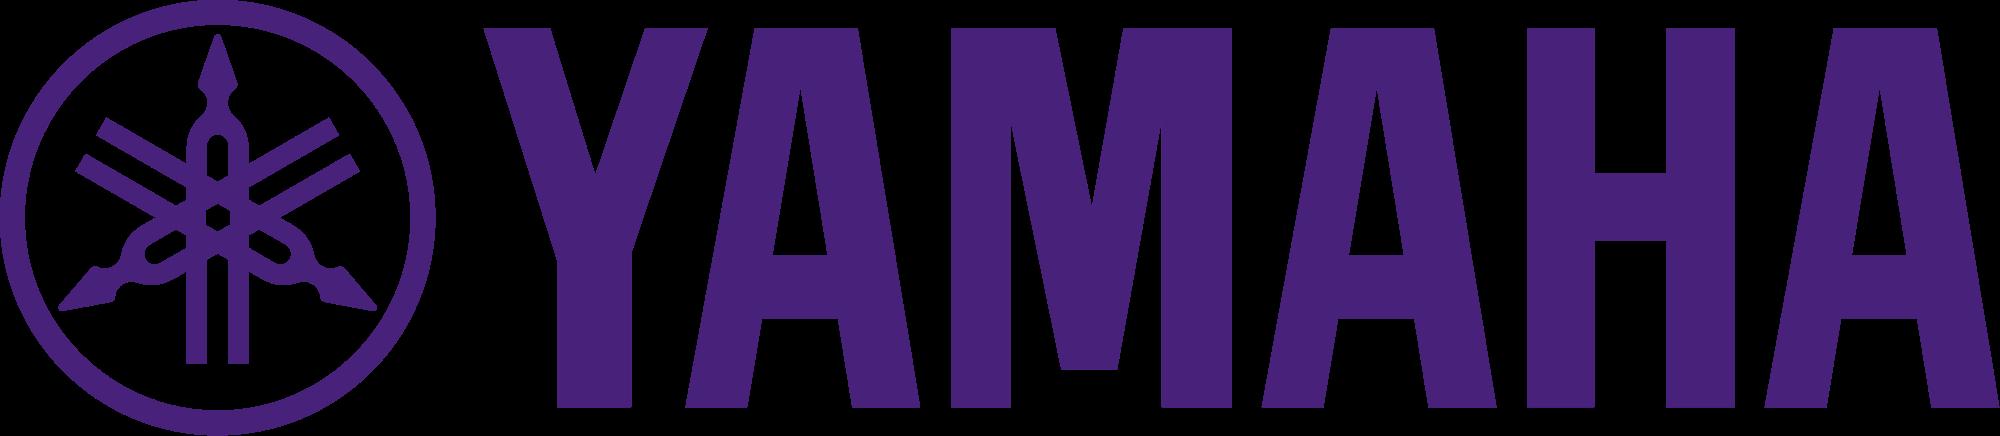 free yamaha vector emblem #109289569